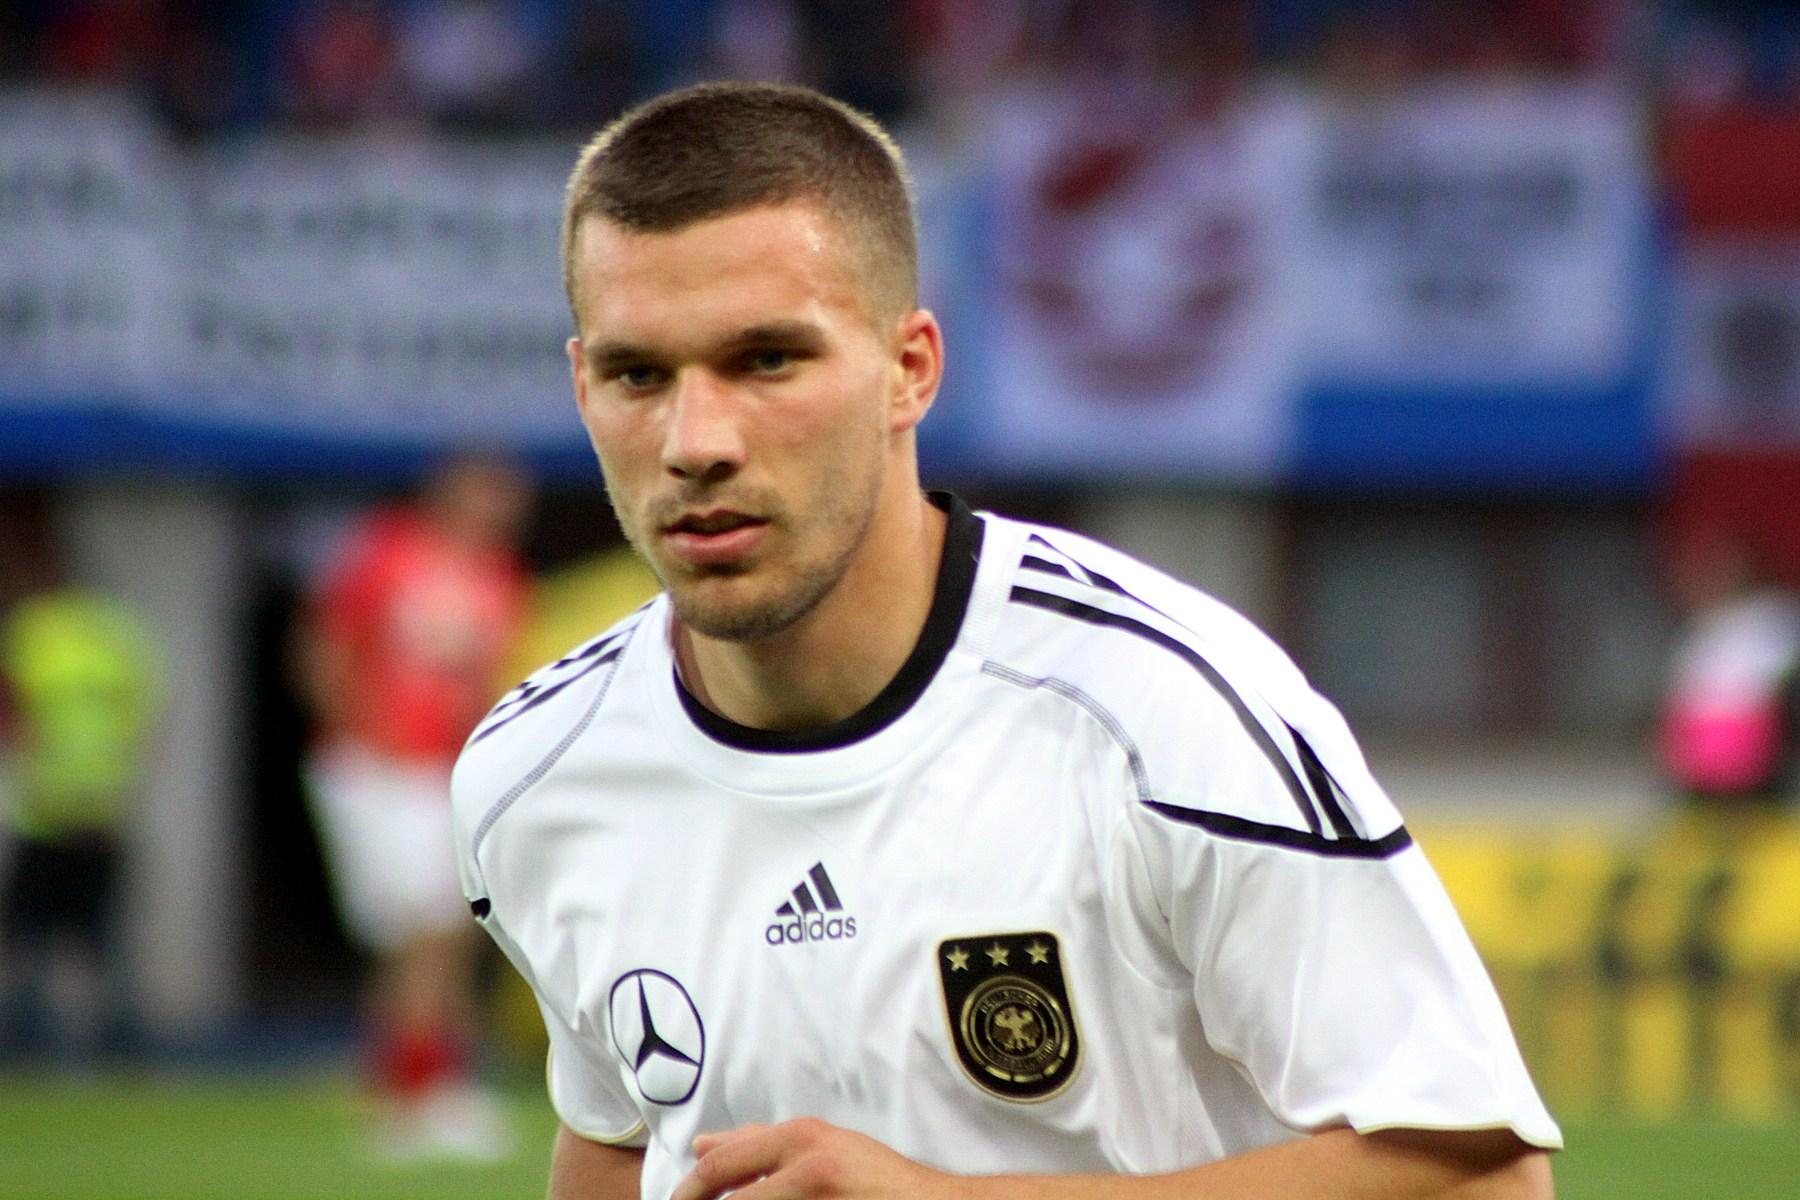 FileLukas Podolski Germany National Football Team 05